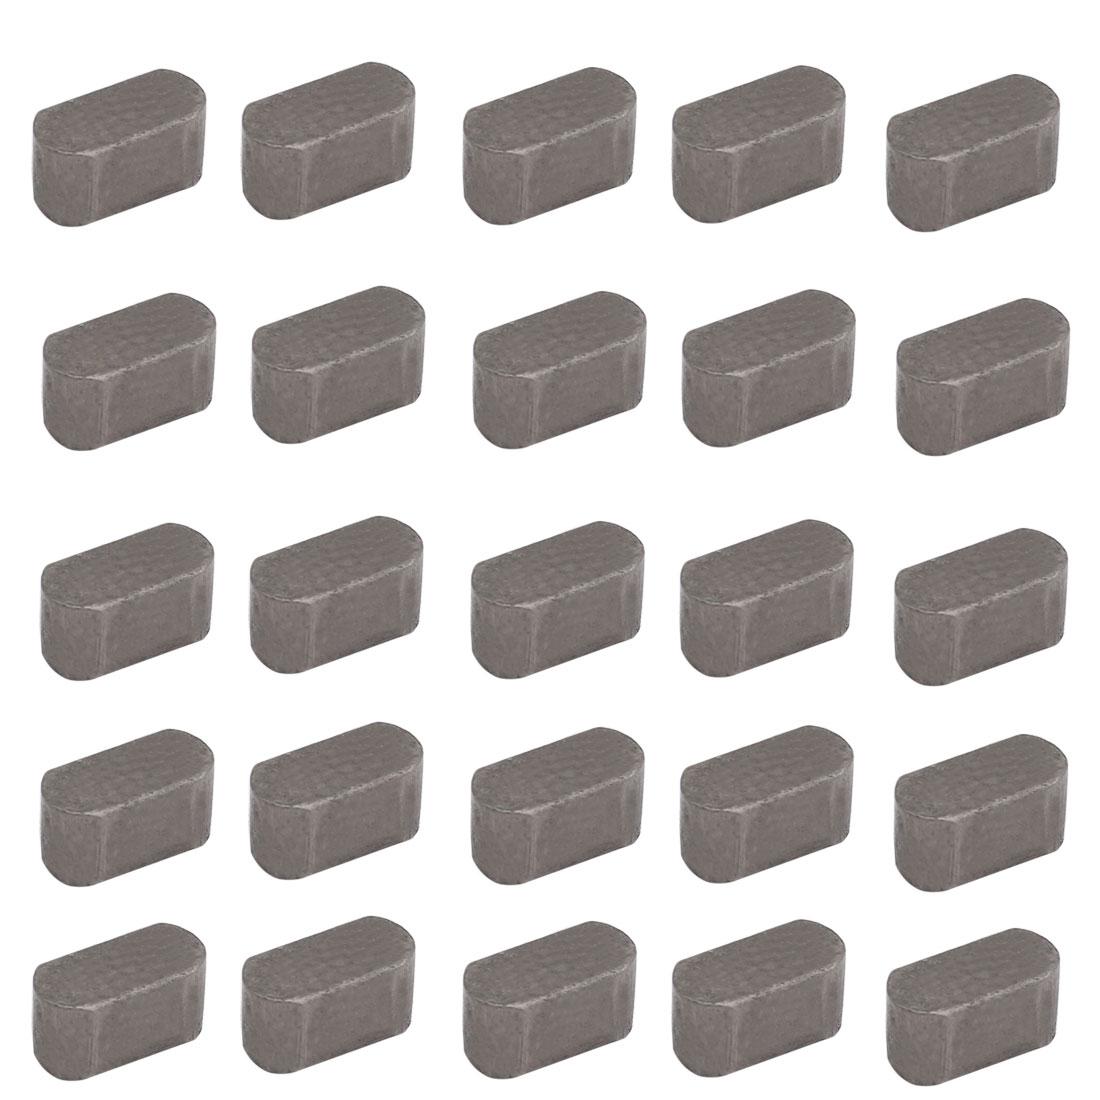 12mmx6mmx6mm Carbon Steel Key Stock To Lock Pulleys 25pcs